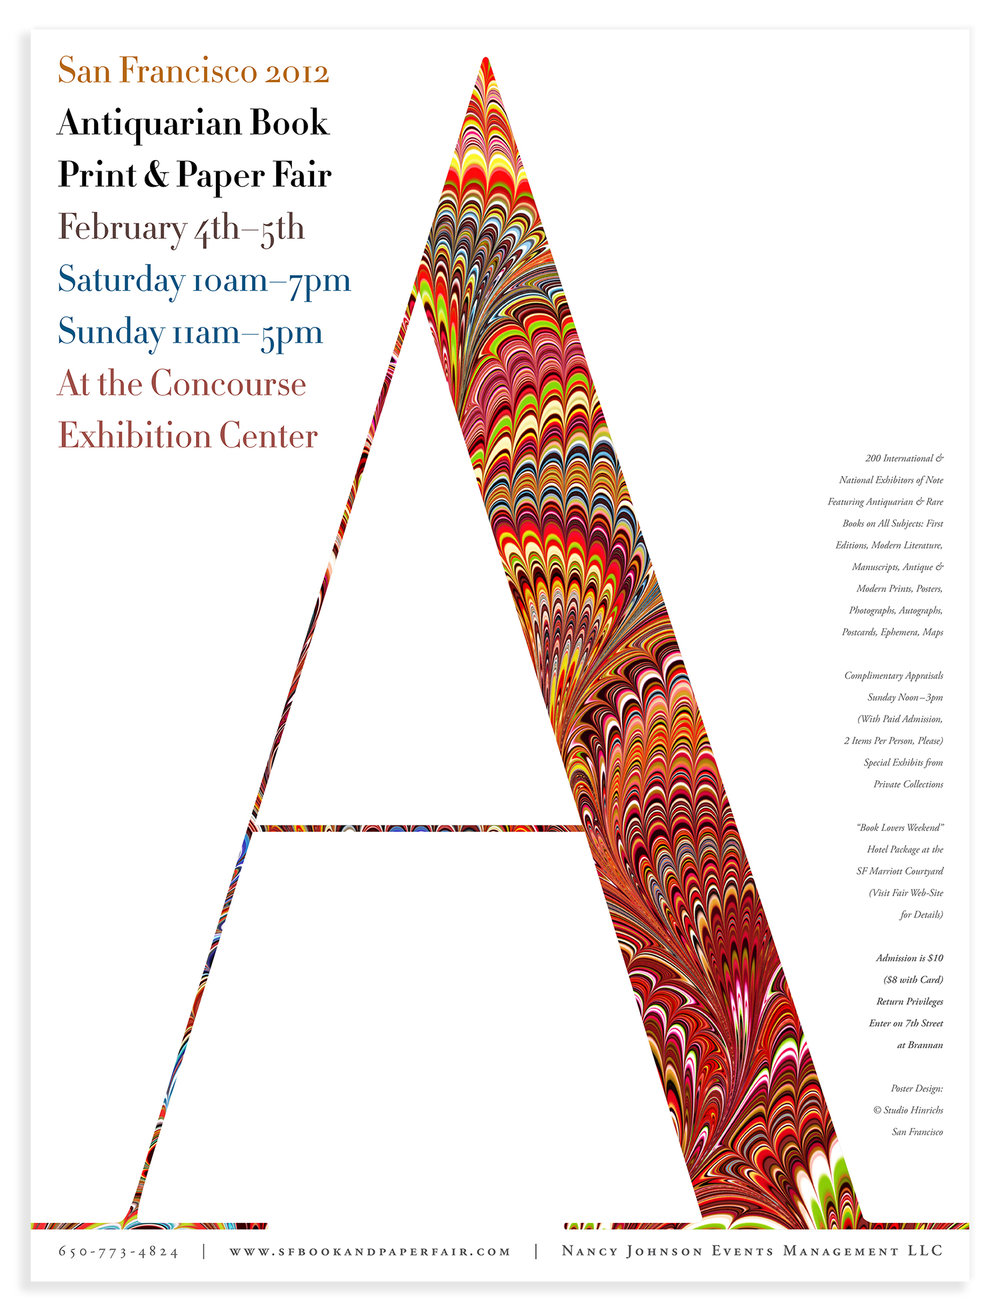 Biannual Book Print & Paper show.